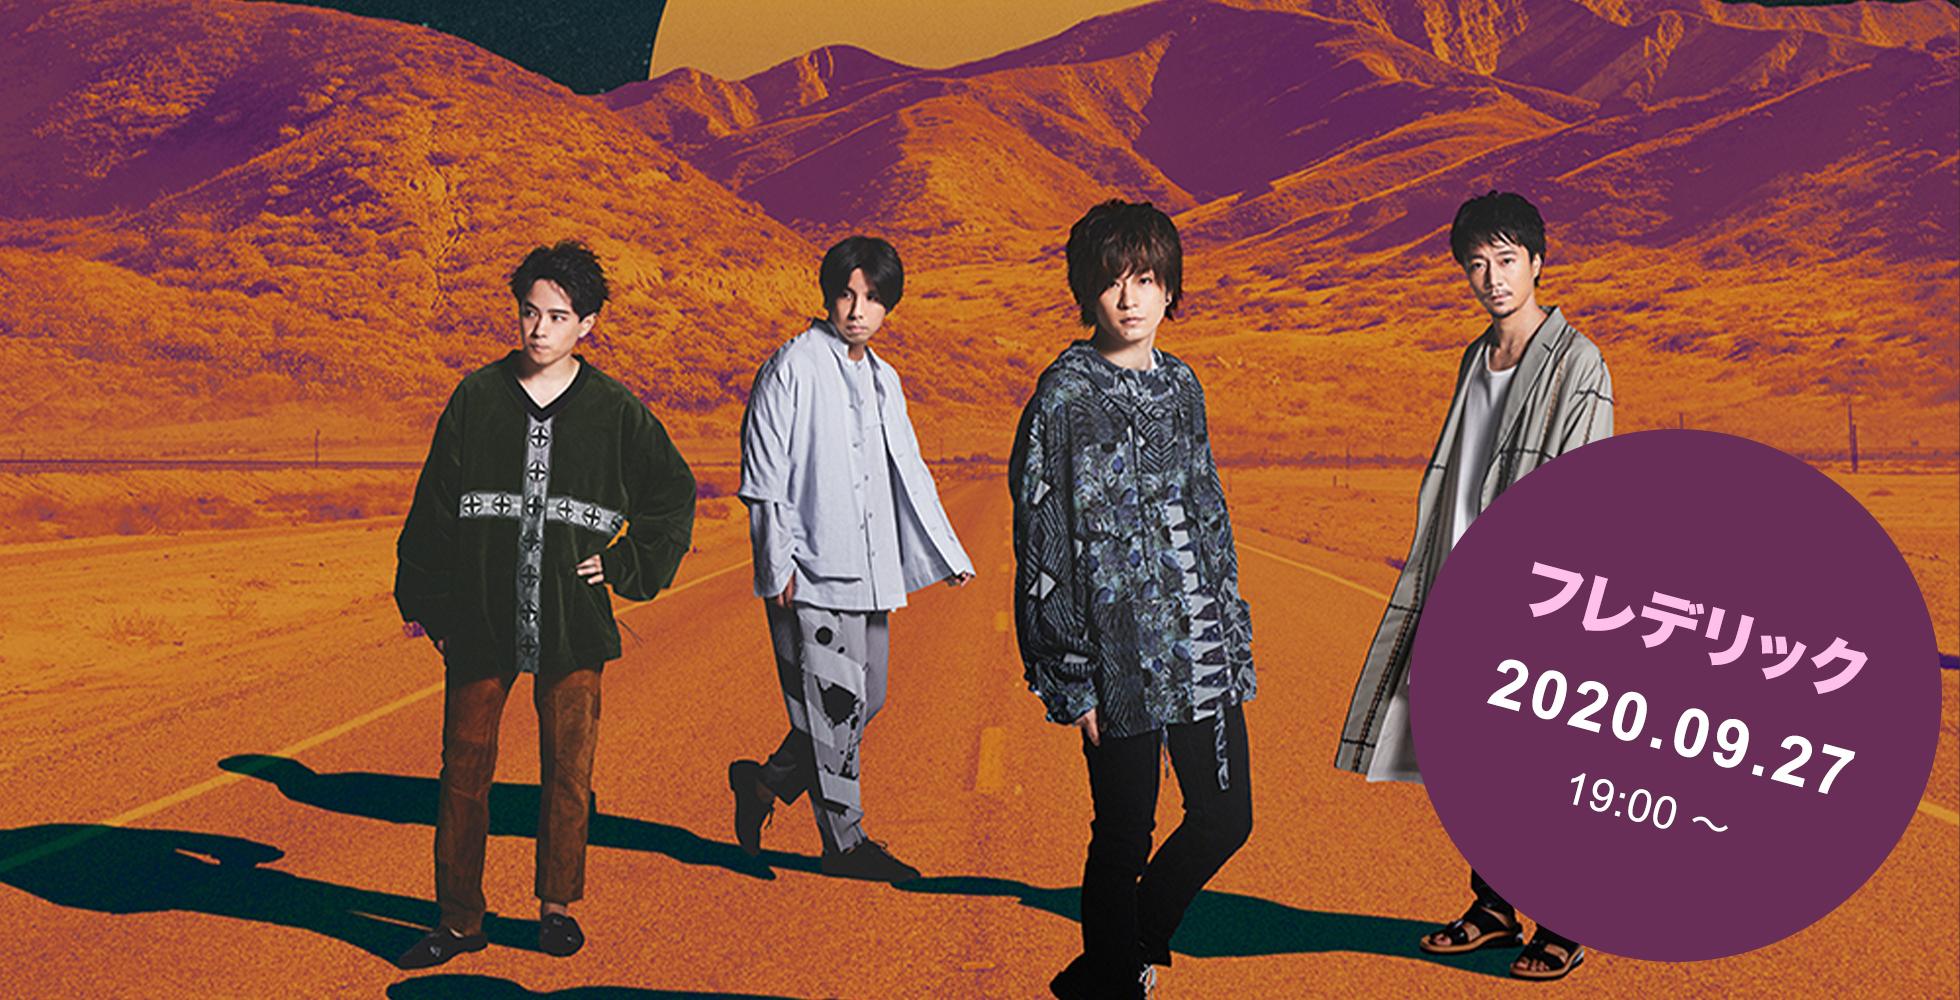 FREDERHYTHM ONLINE「ASOVISION〜FRDC × INT〜」